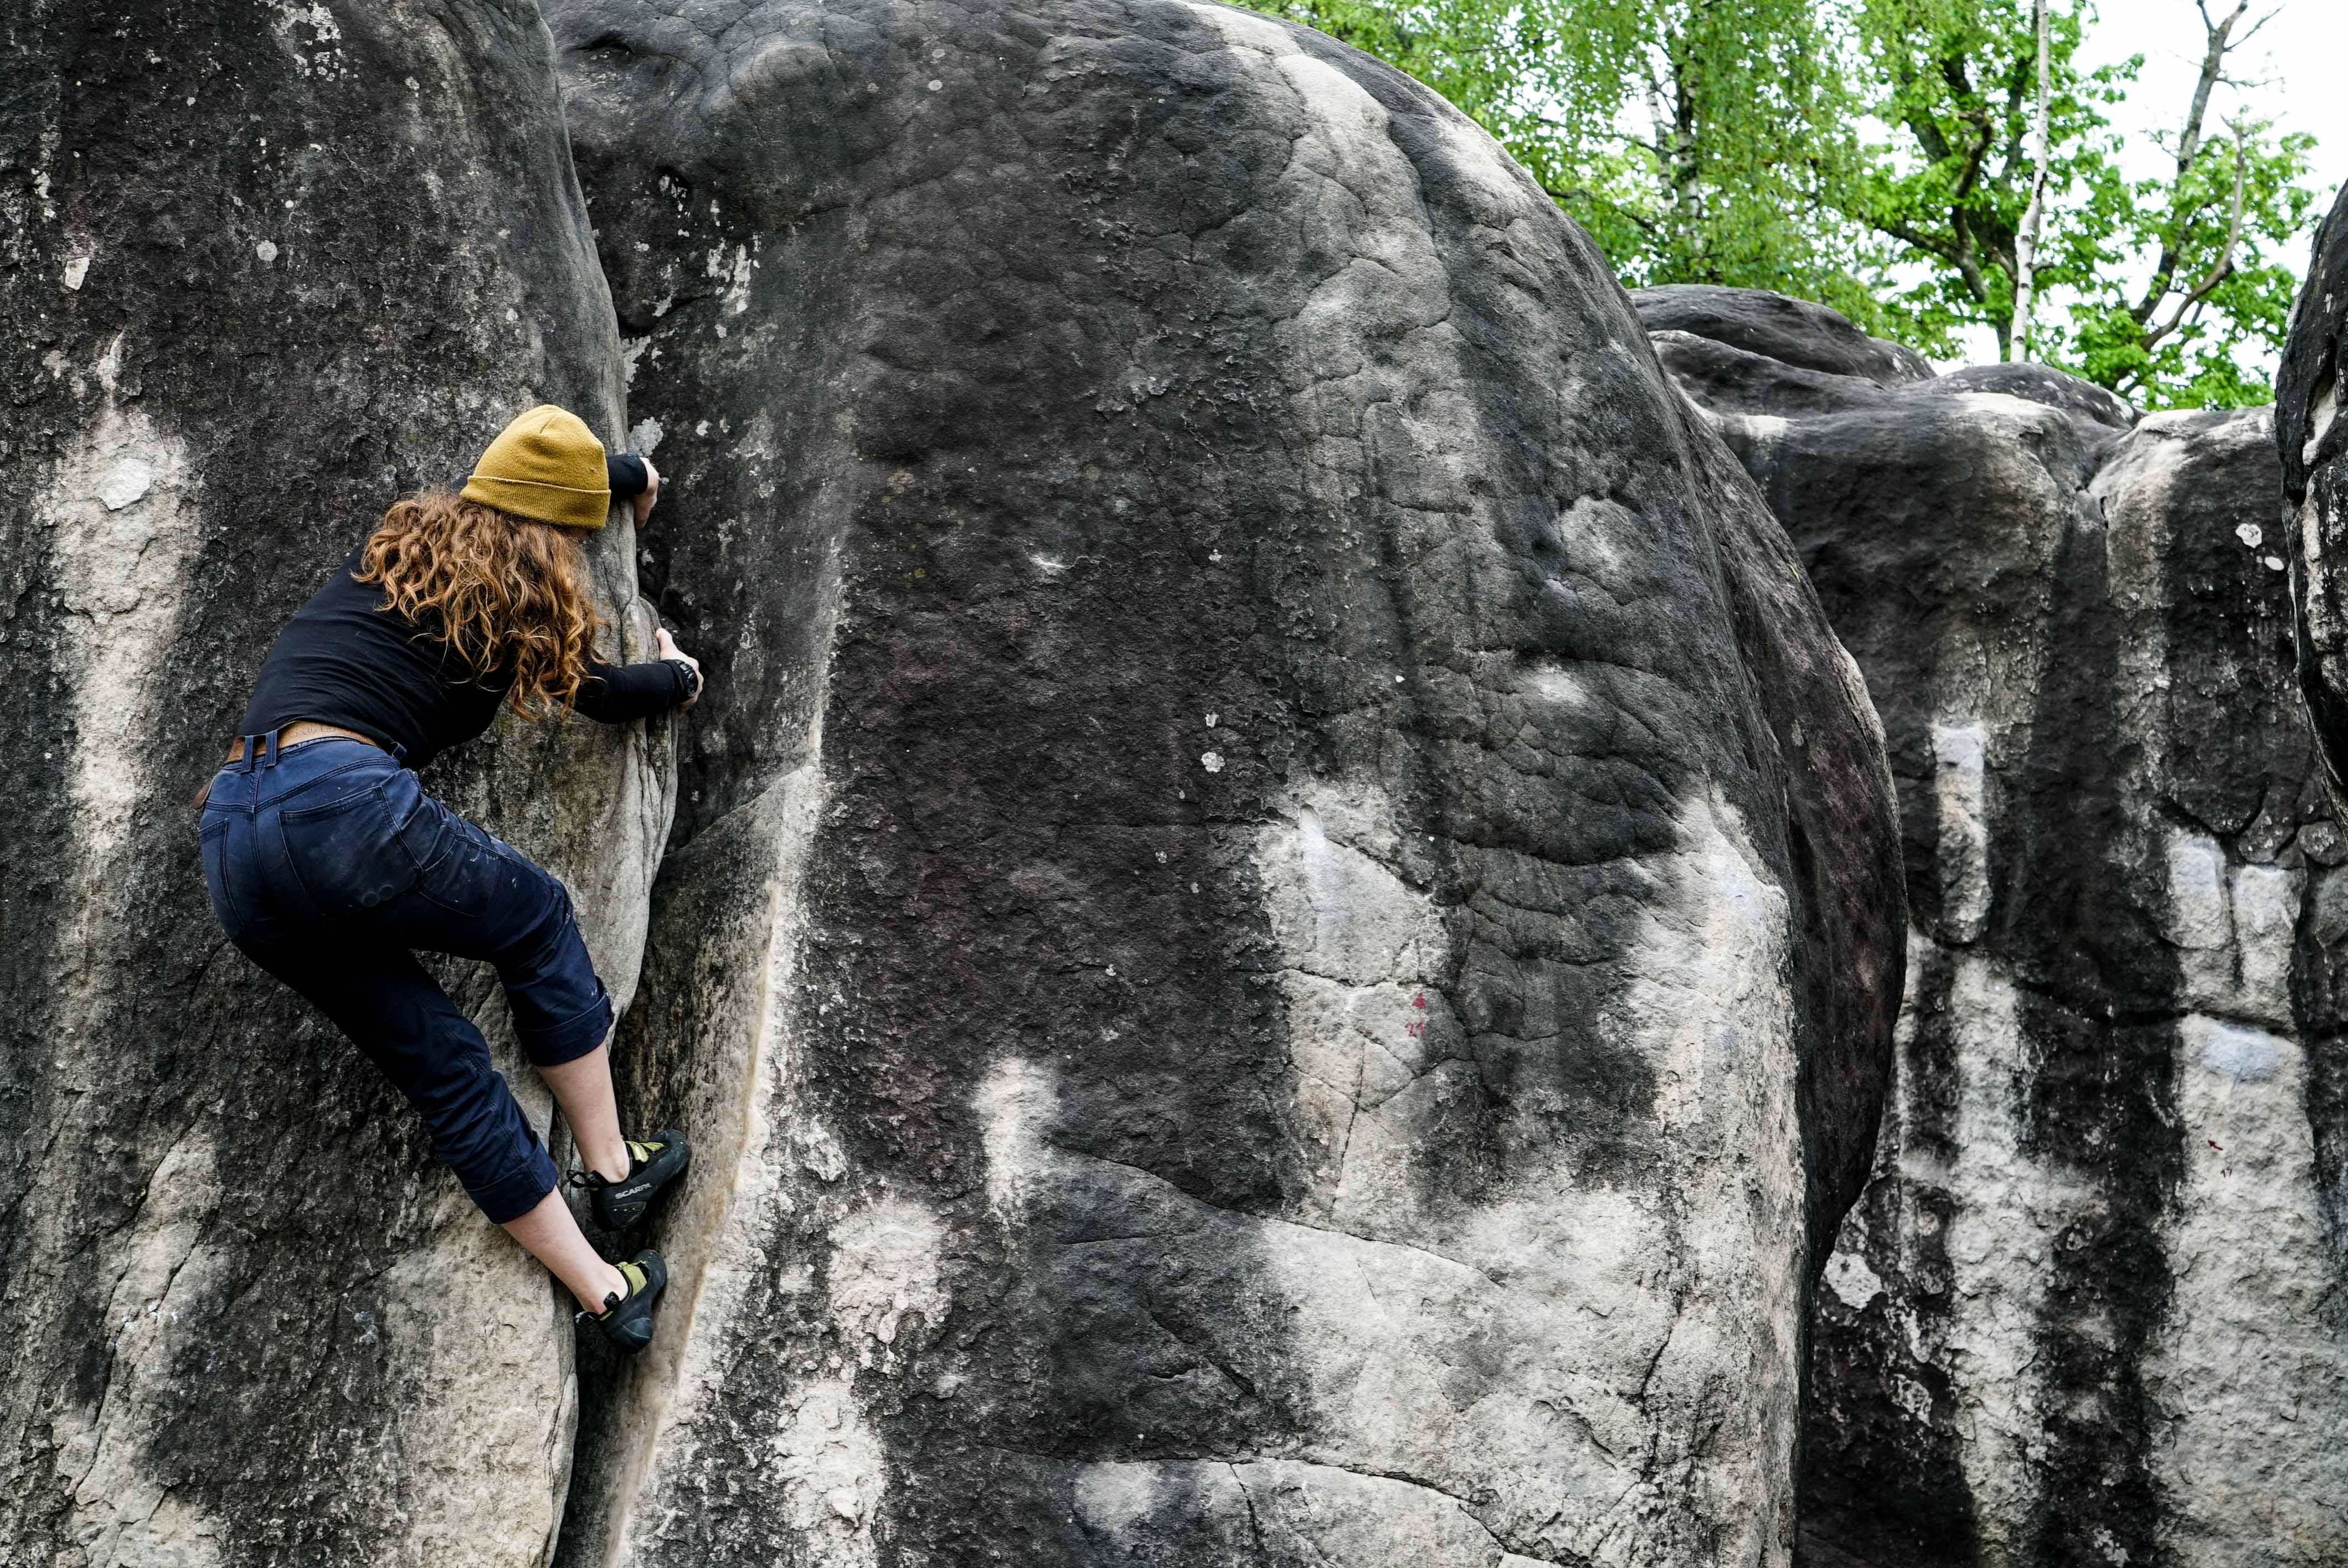 fontainbleau climbing 2016 mike brindley-35